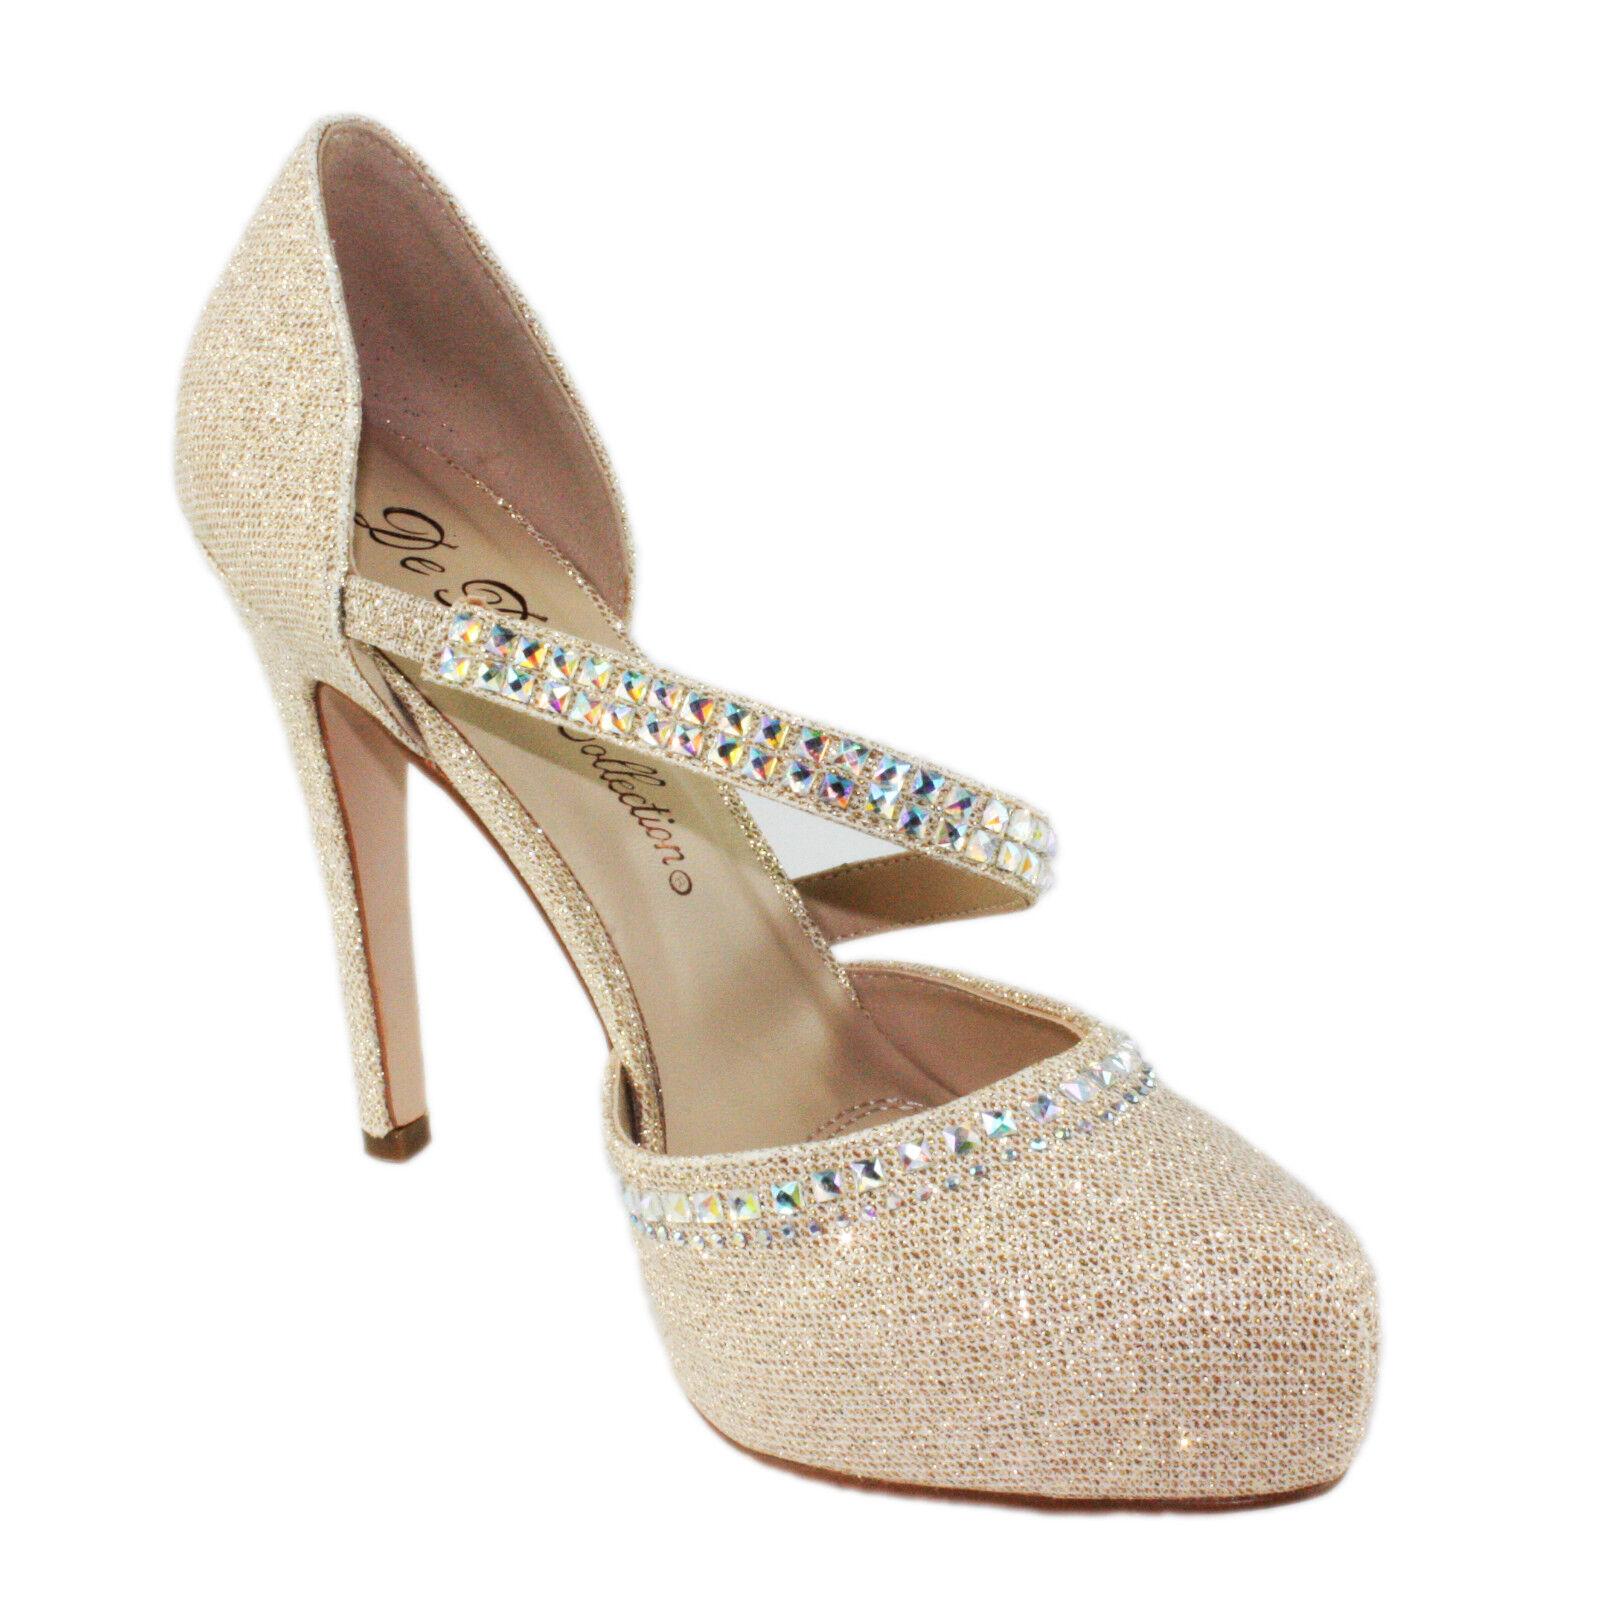 Blossom Summer-44 Almond-Toe Almond-Toe D'orsay Party Bridal Platform High Heels